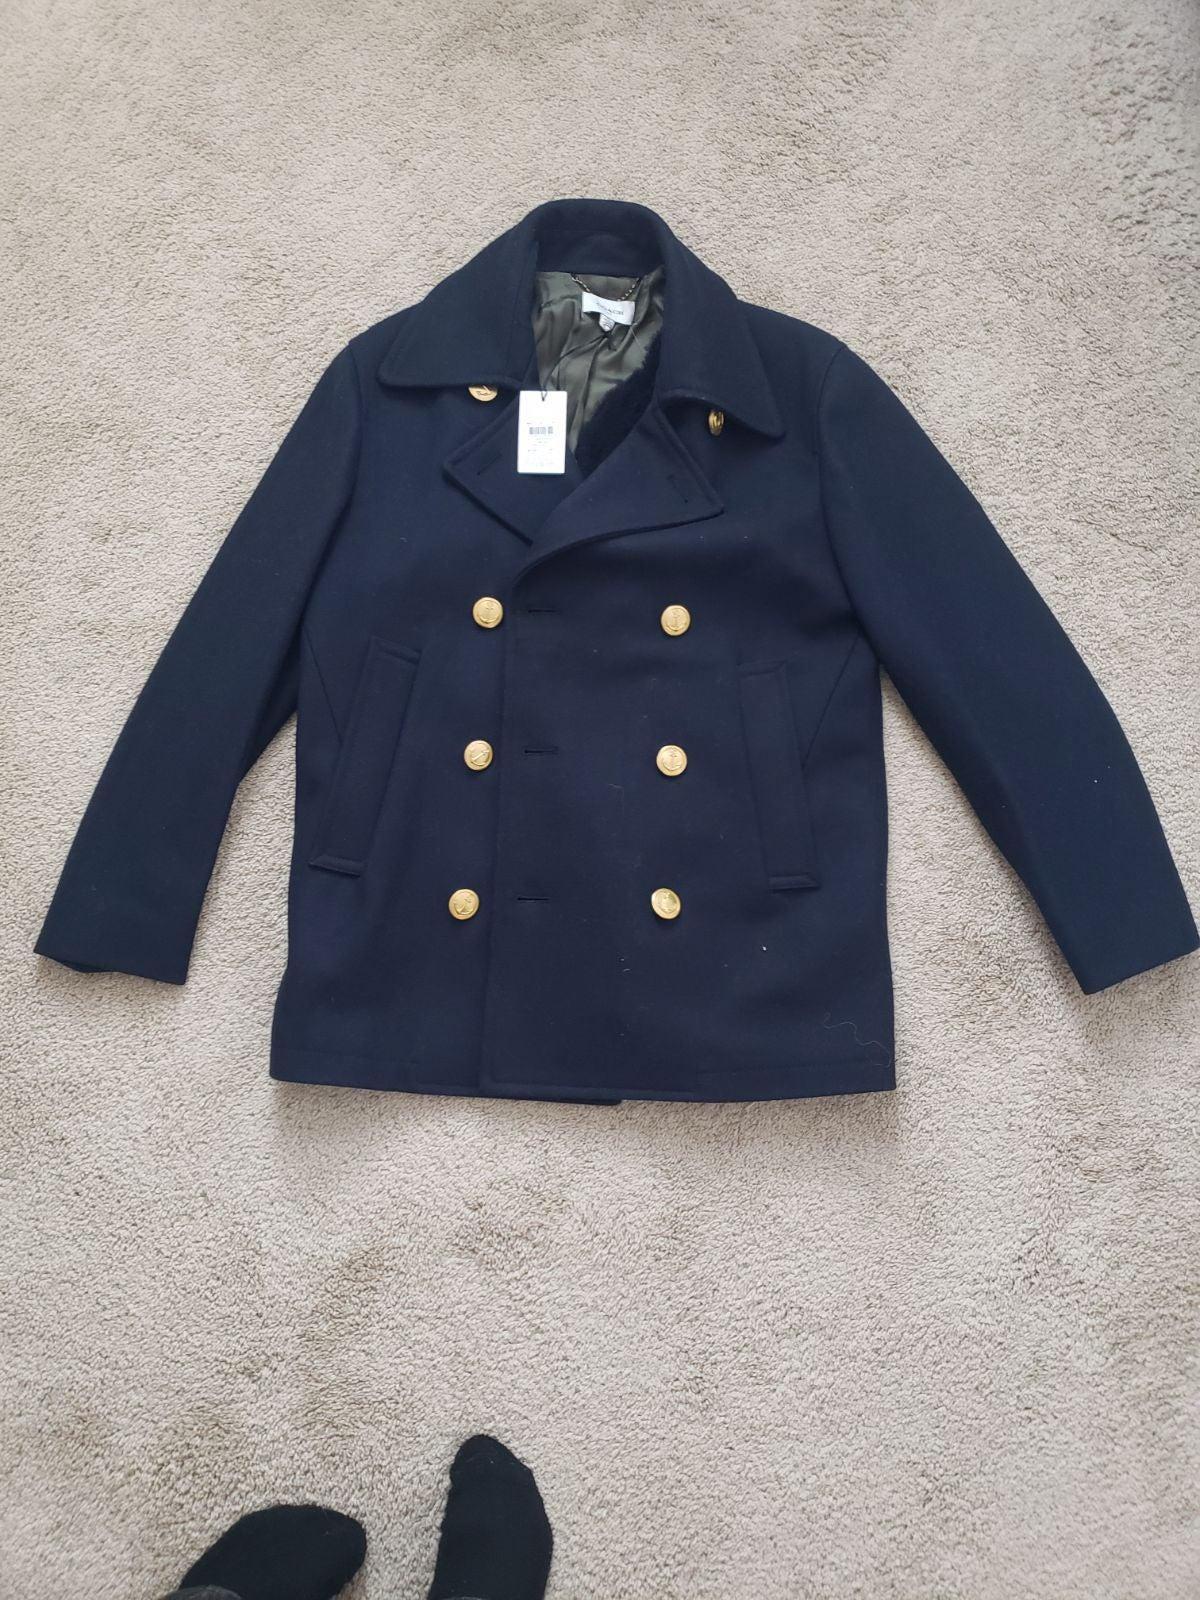 NWT Coach 1941 Mariners Pea Coat Size 46